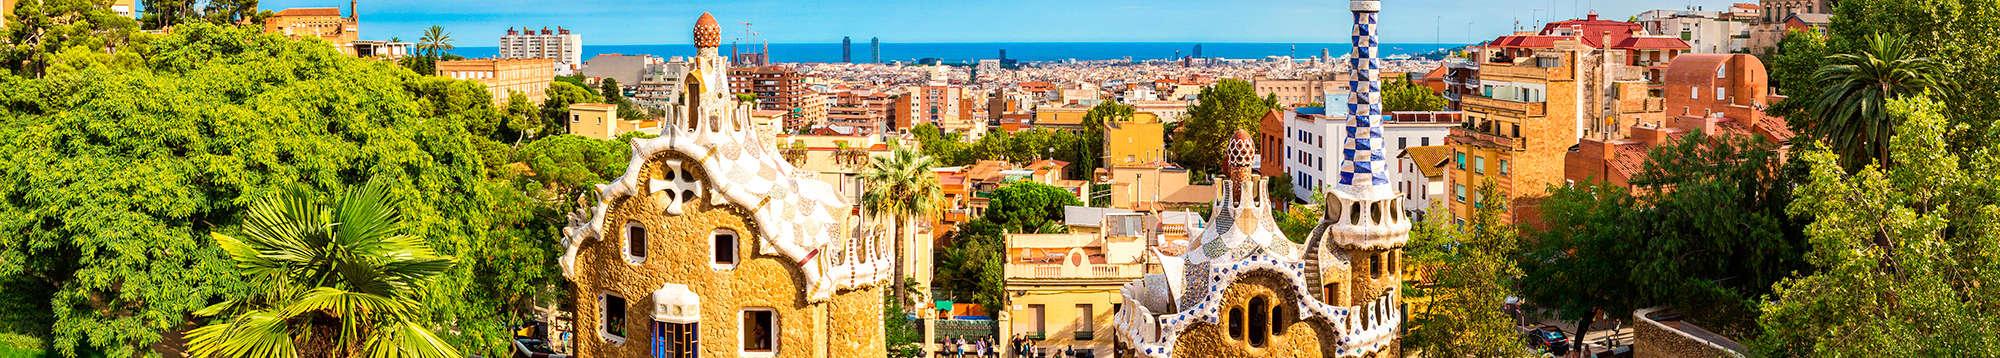 Week-end et séjour Barcelone